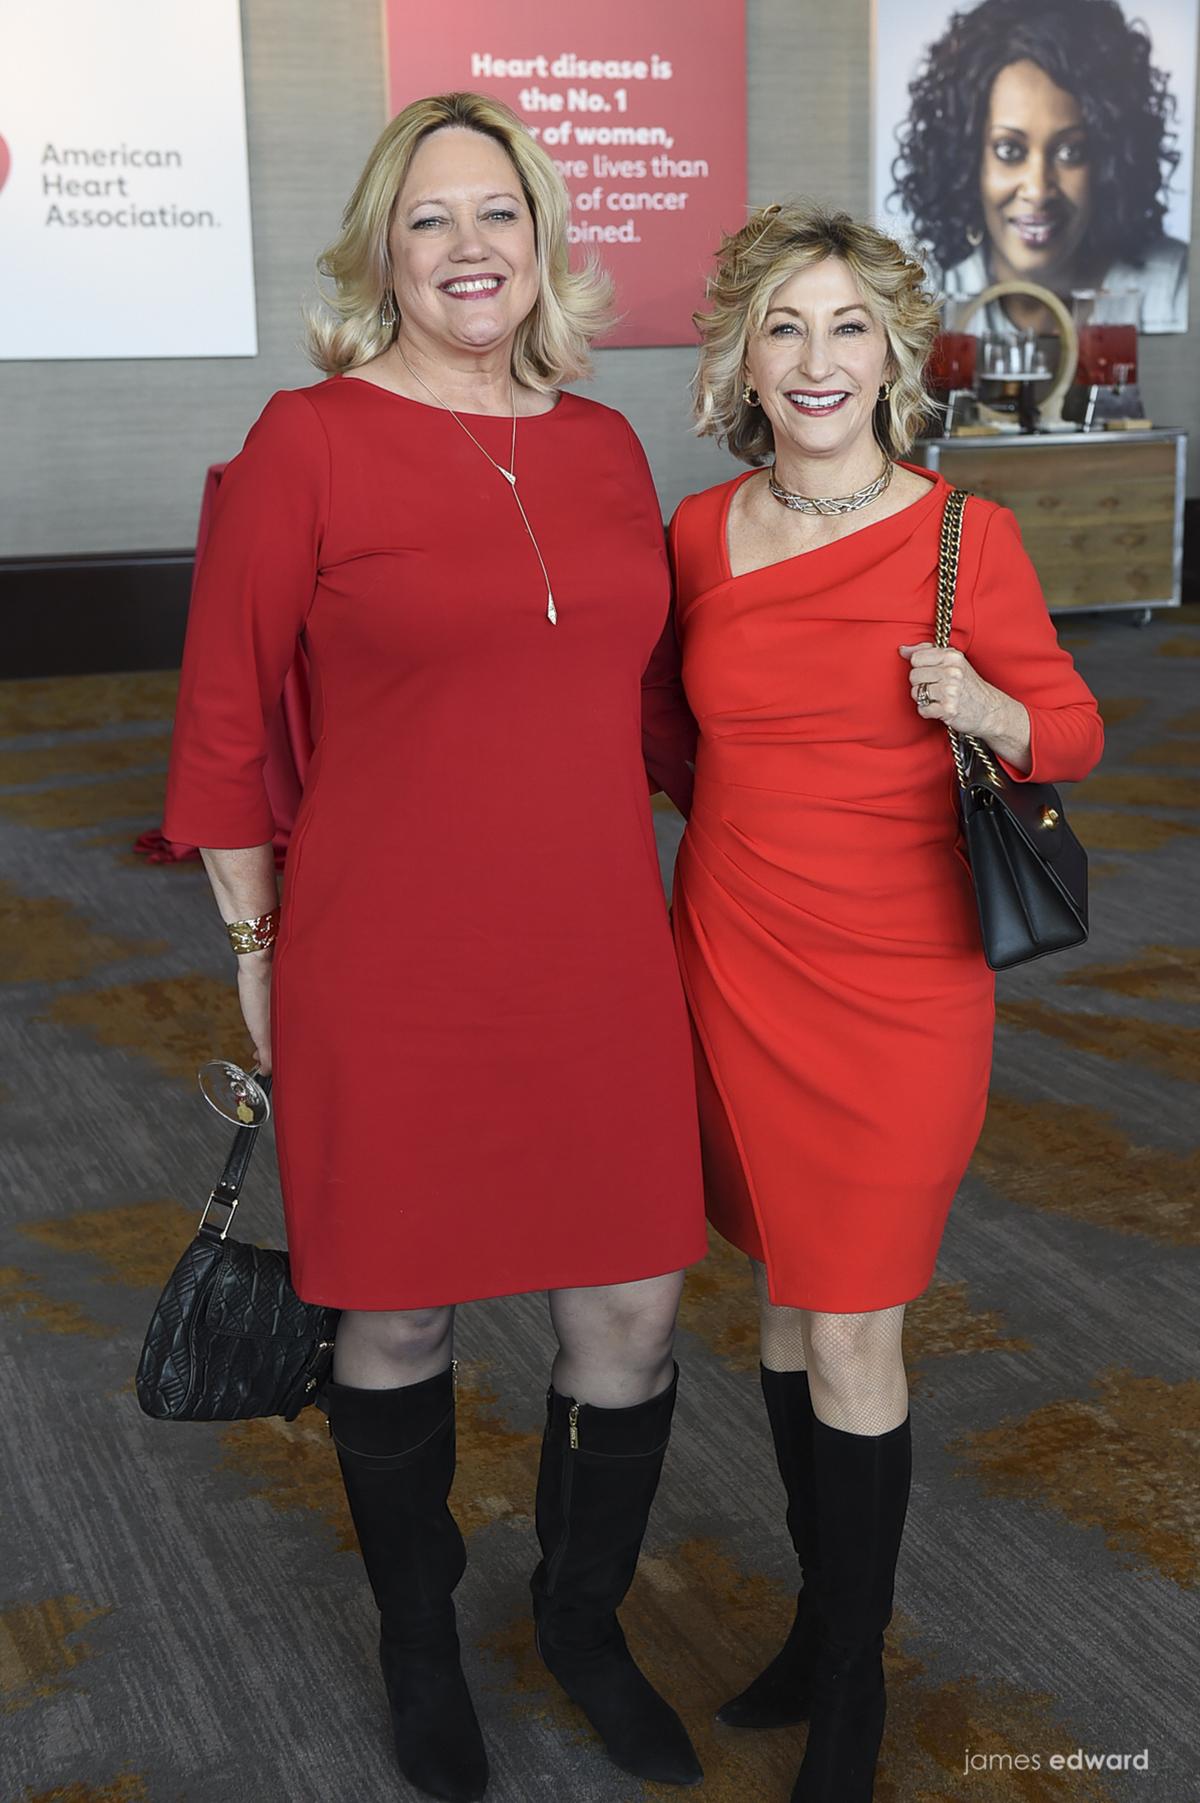 Diane Parmerlee and Elise Mobley Turner